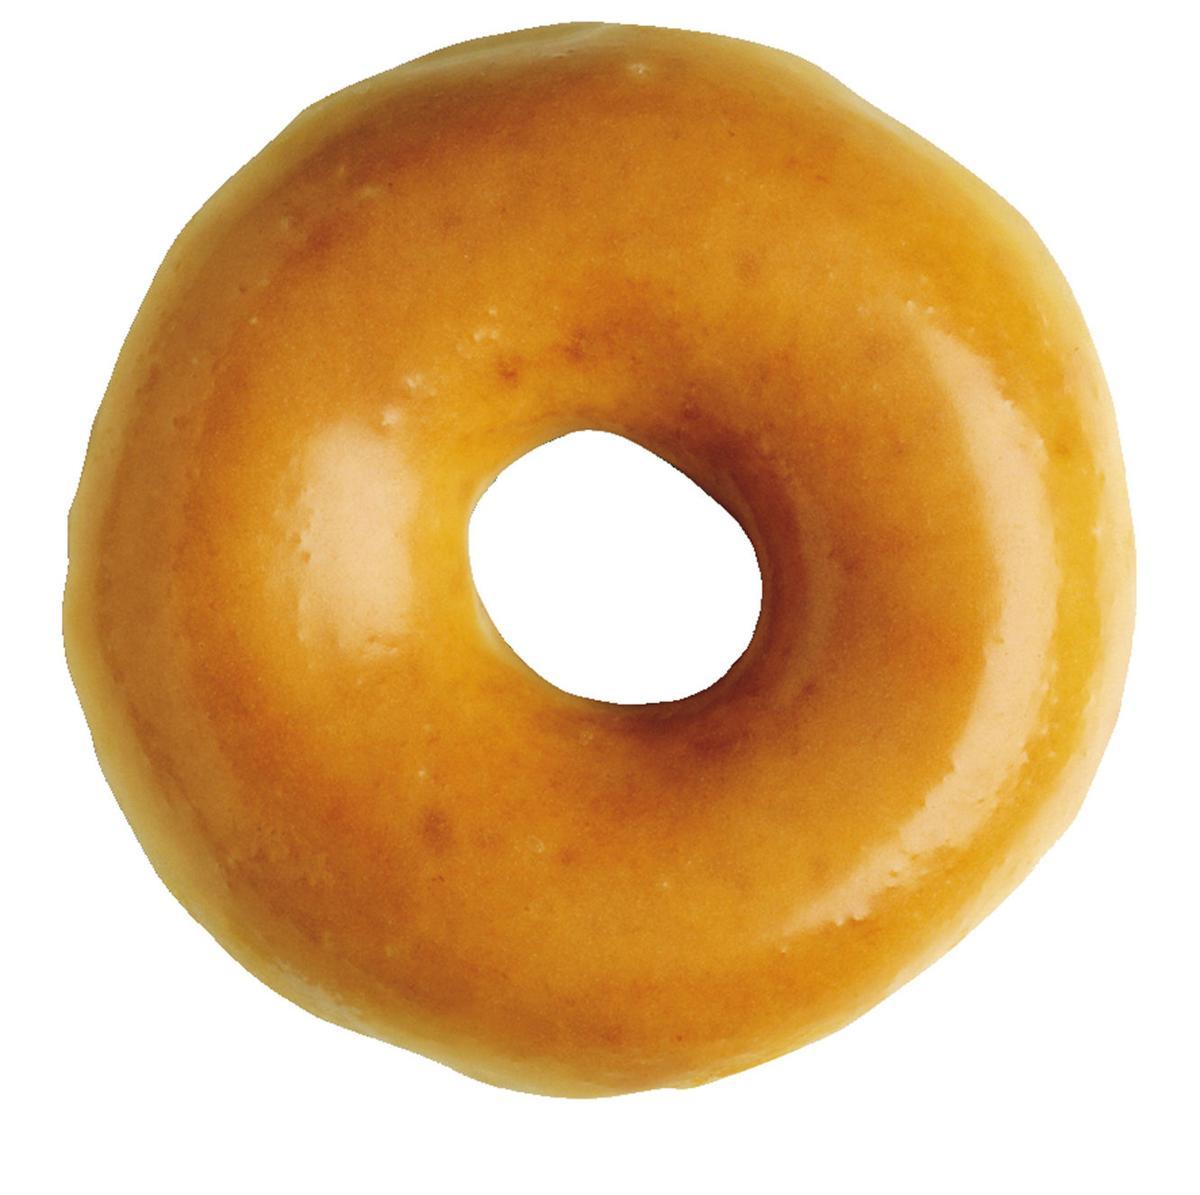 doughnut cutout